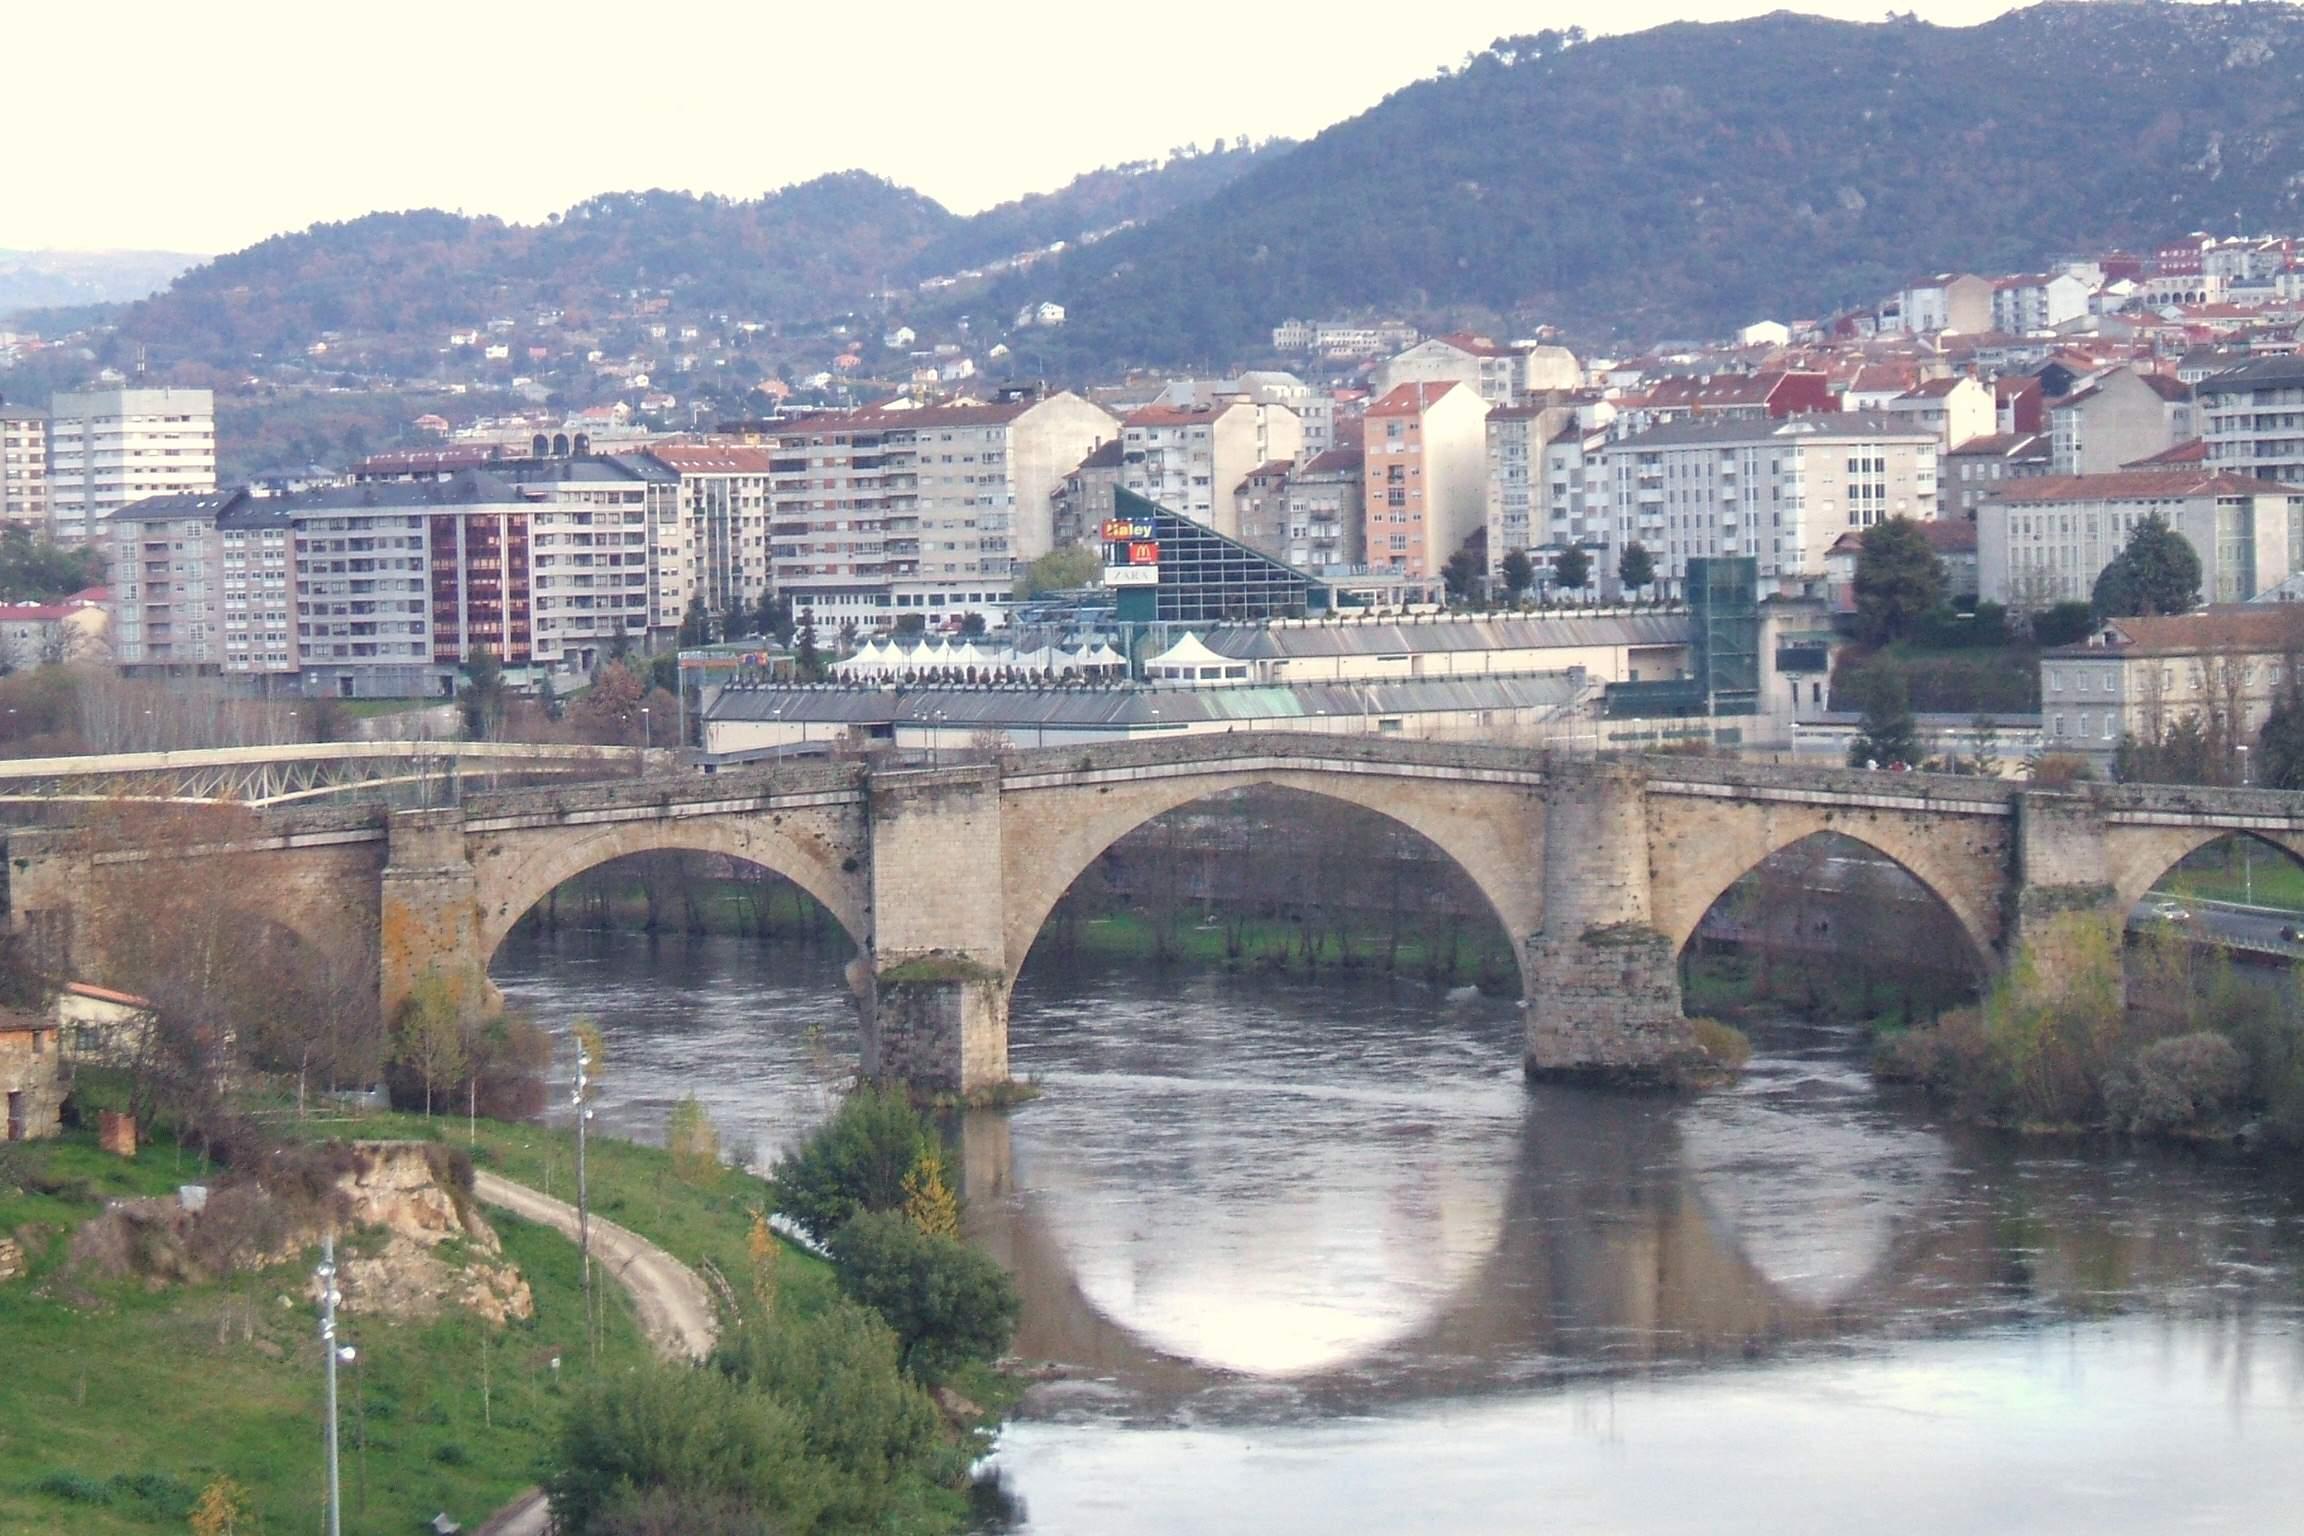 File:Orense - Ponte Maior 1.jpg - Wikimedia Commons